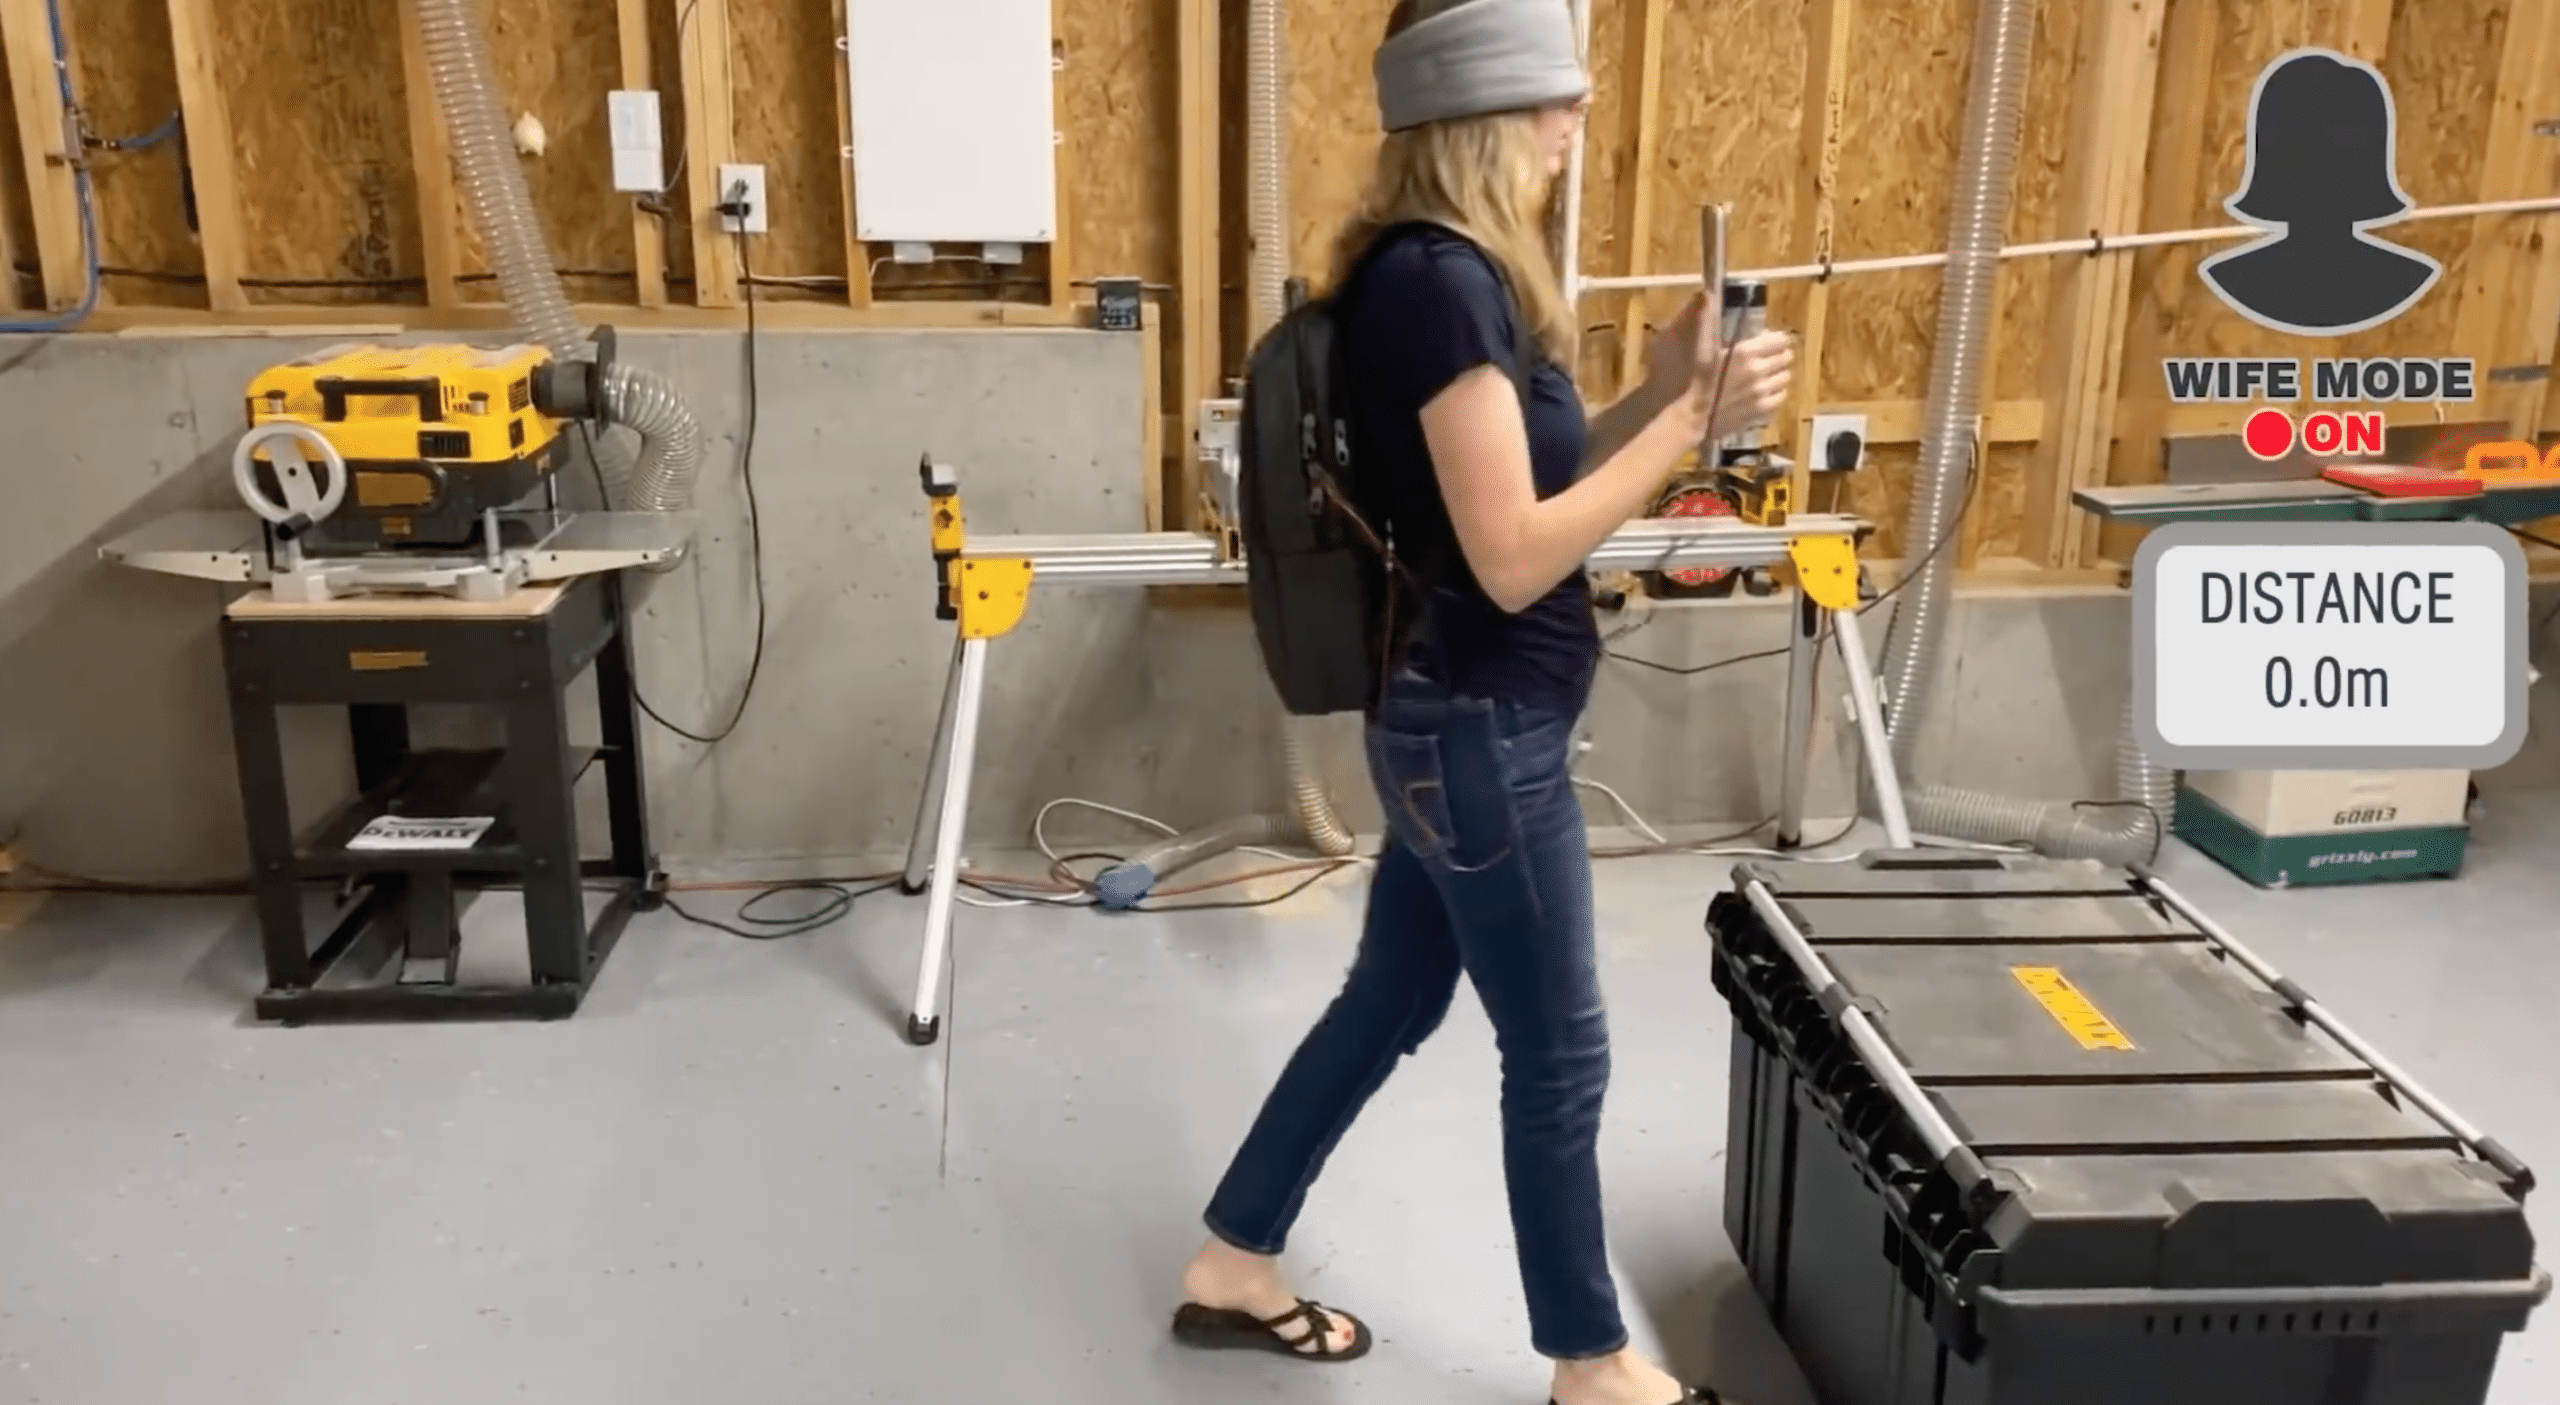 Projeto de retorno tátil de obstáculos com scanner LiDAR do iPad Pro